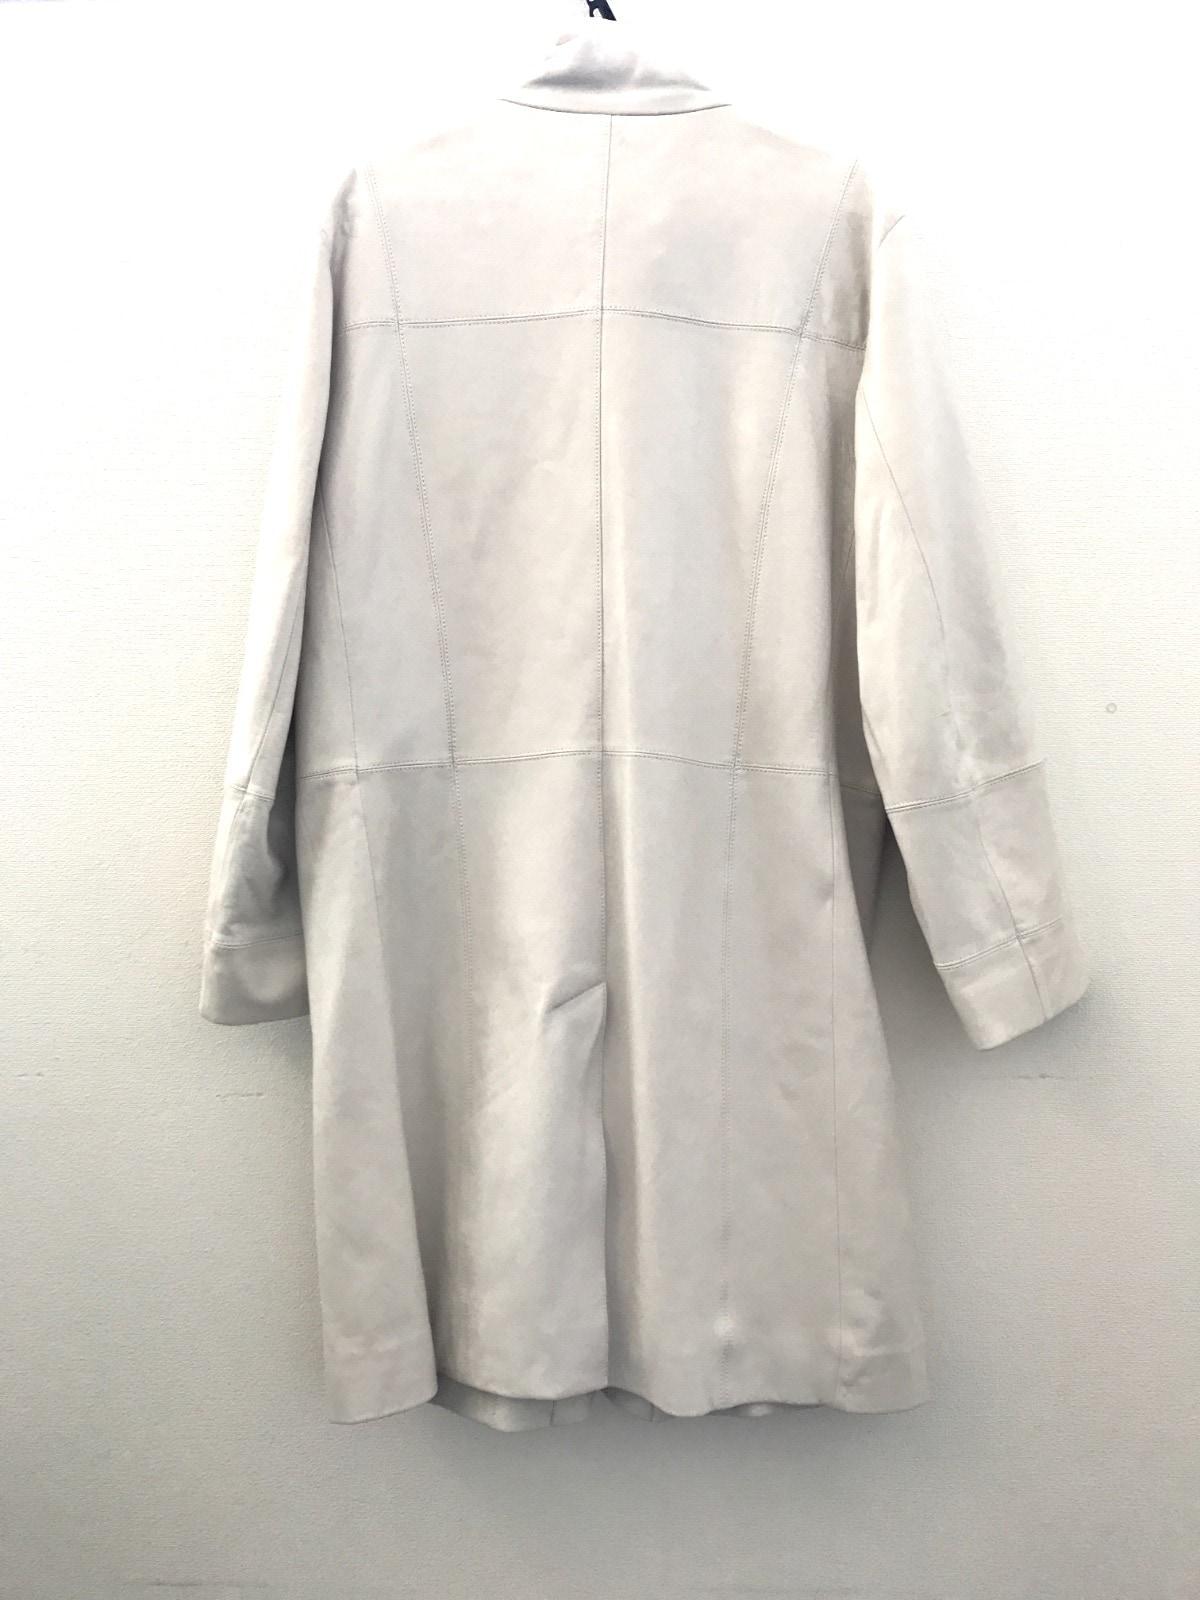 barassi(バラシ)のコート